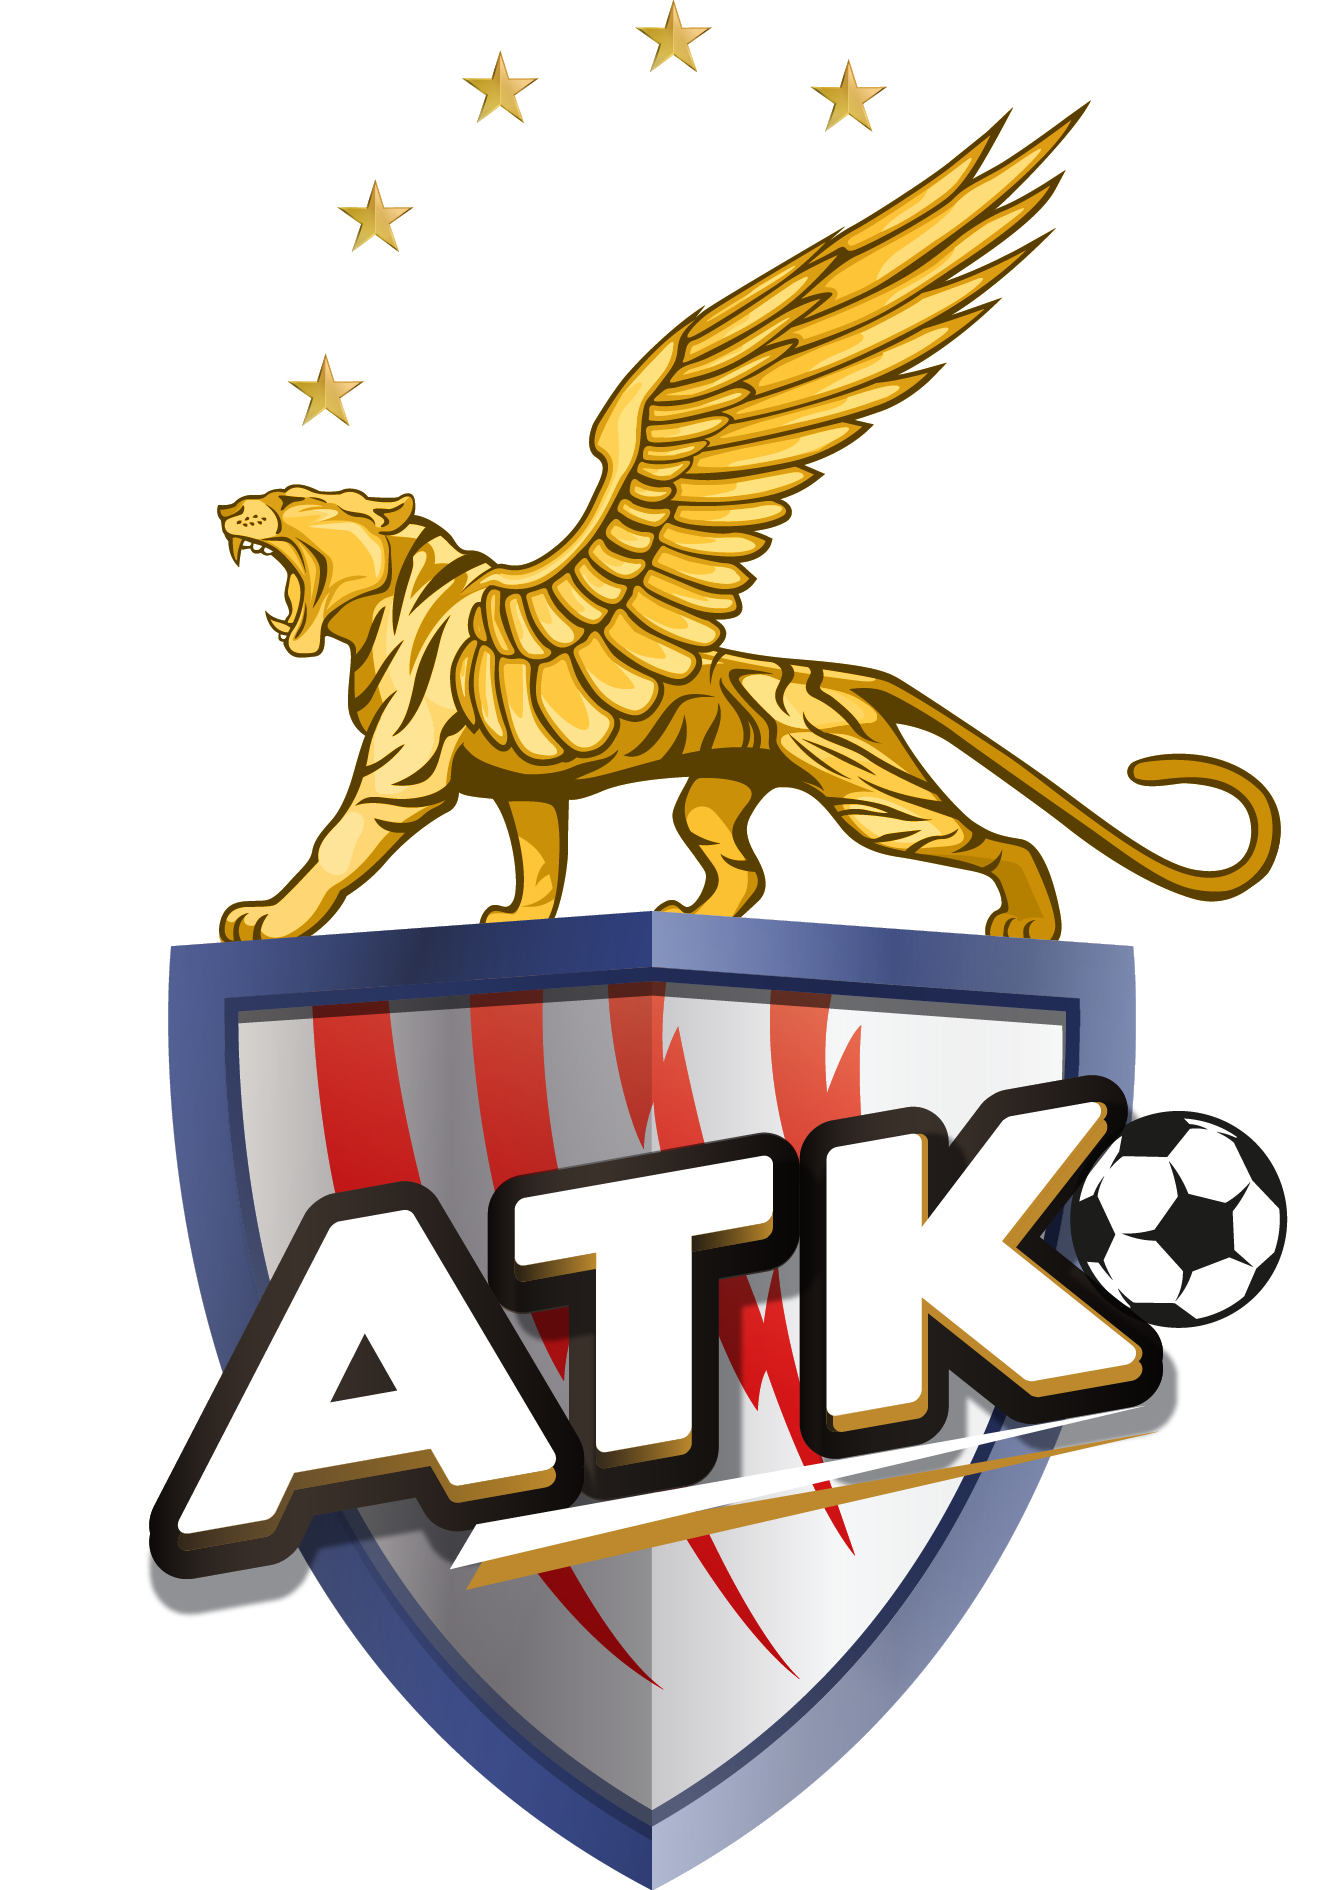 ATKFC KreedOn